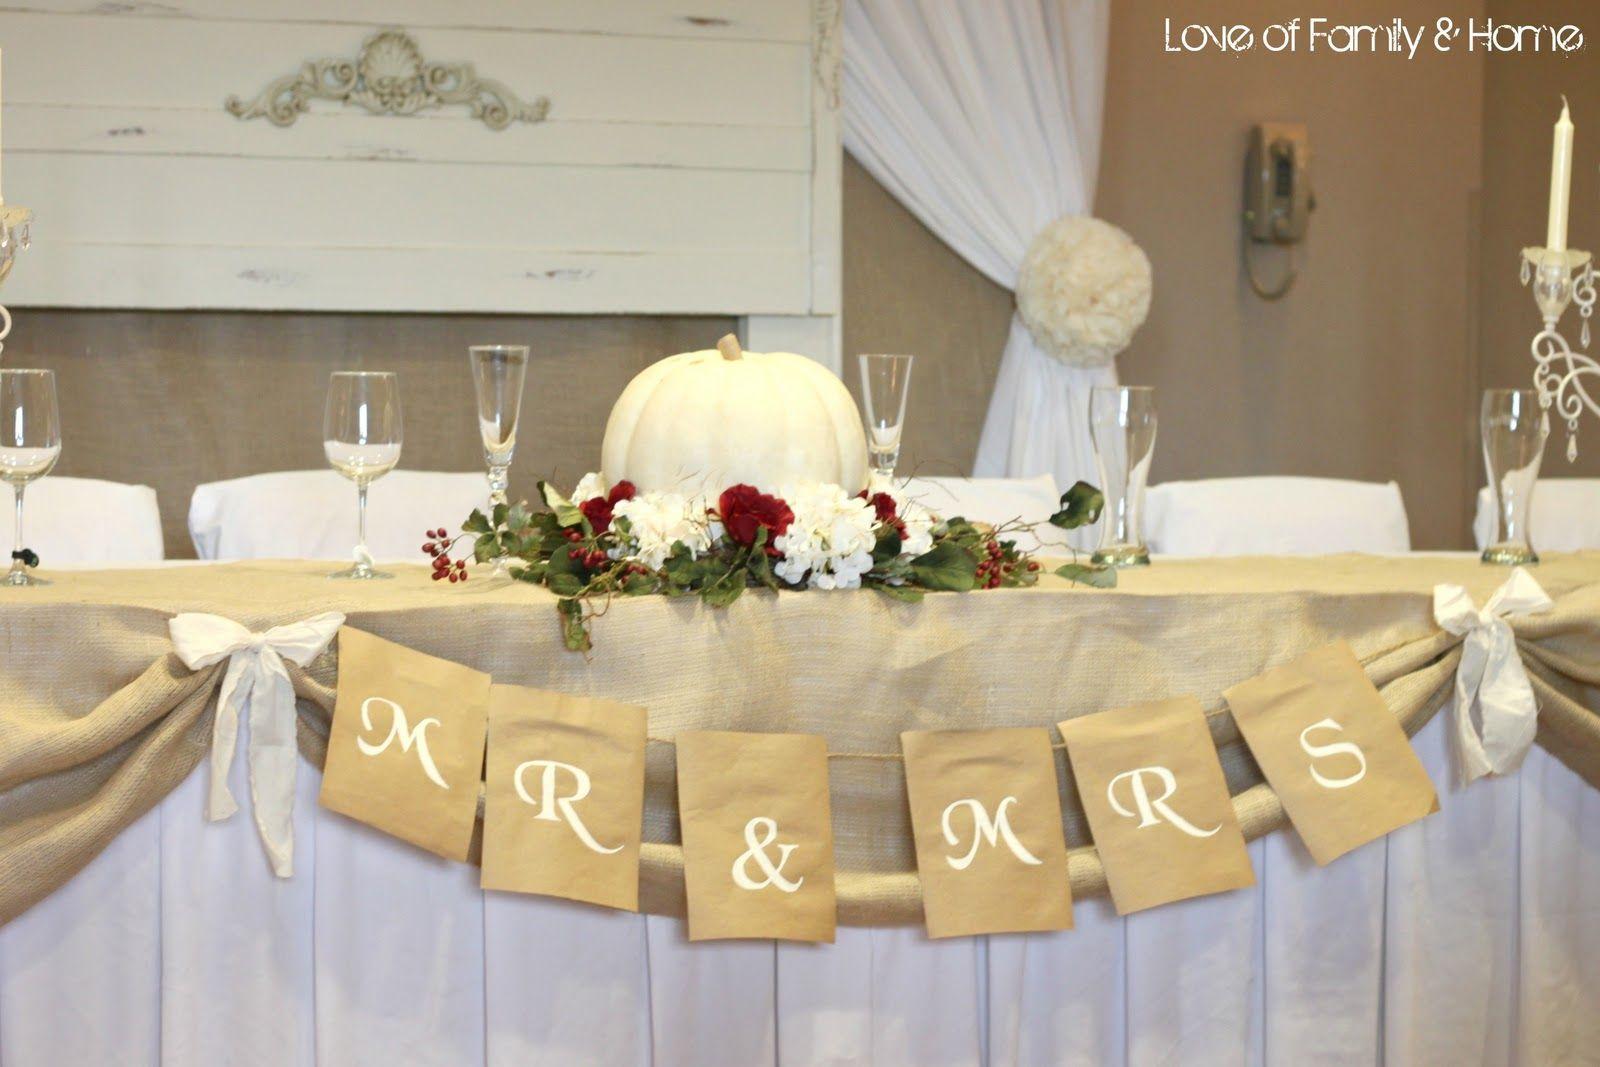 Diy wedding table decorations ideas  Diy Wedding Table Decoration Ideas u Stock Image  wedding ideas